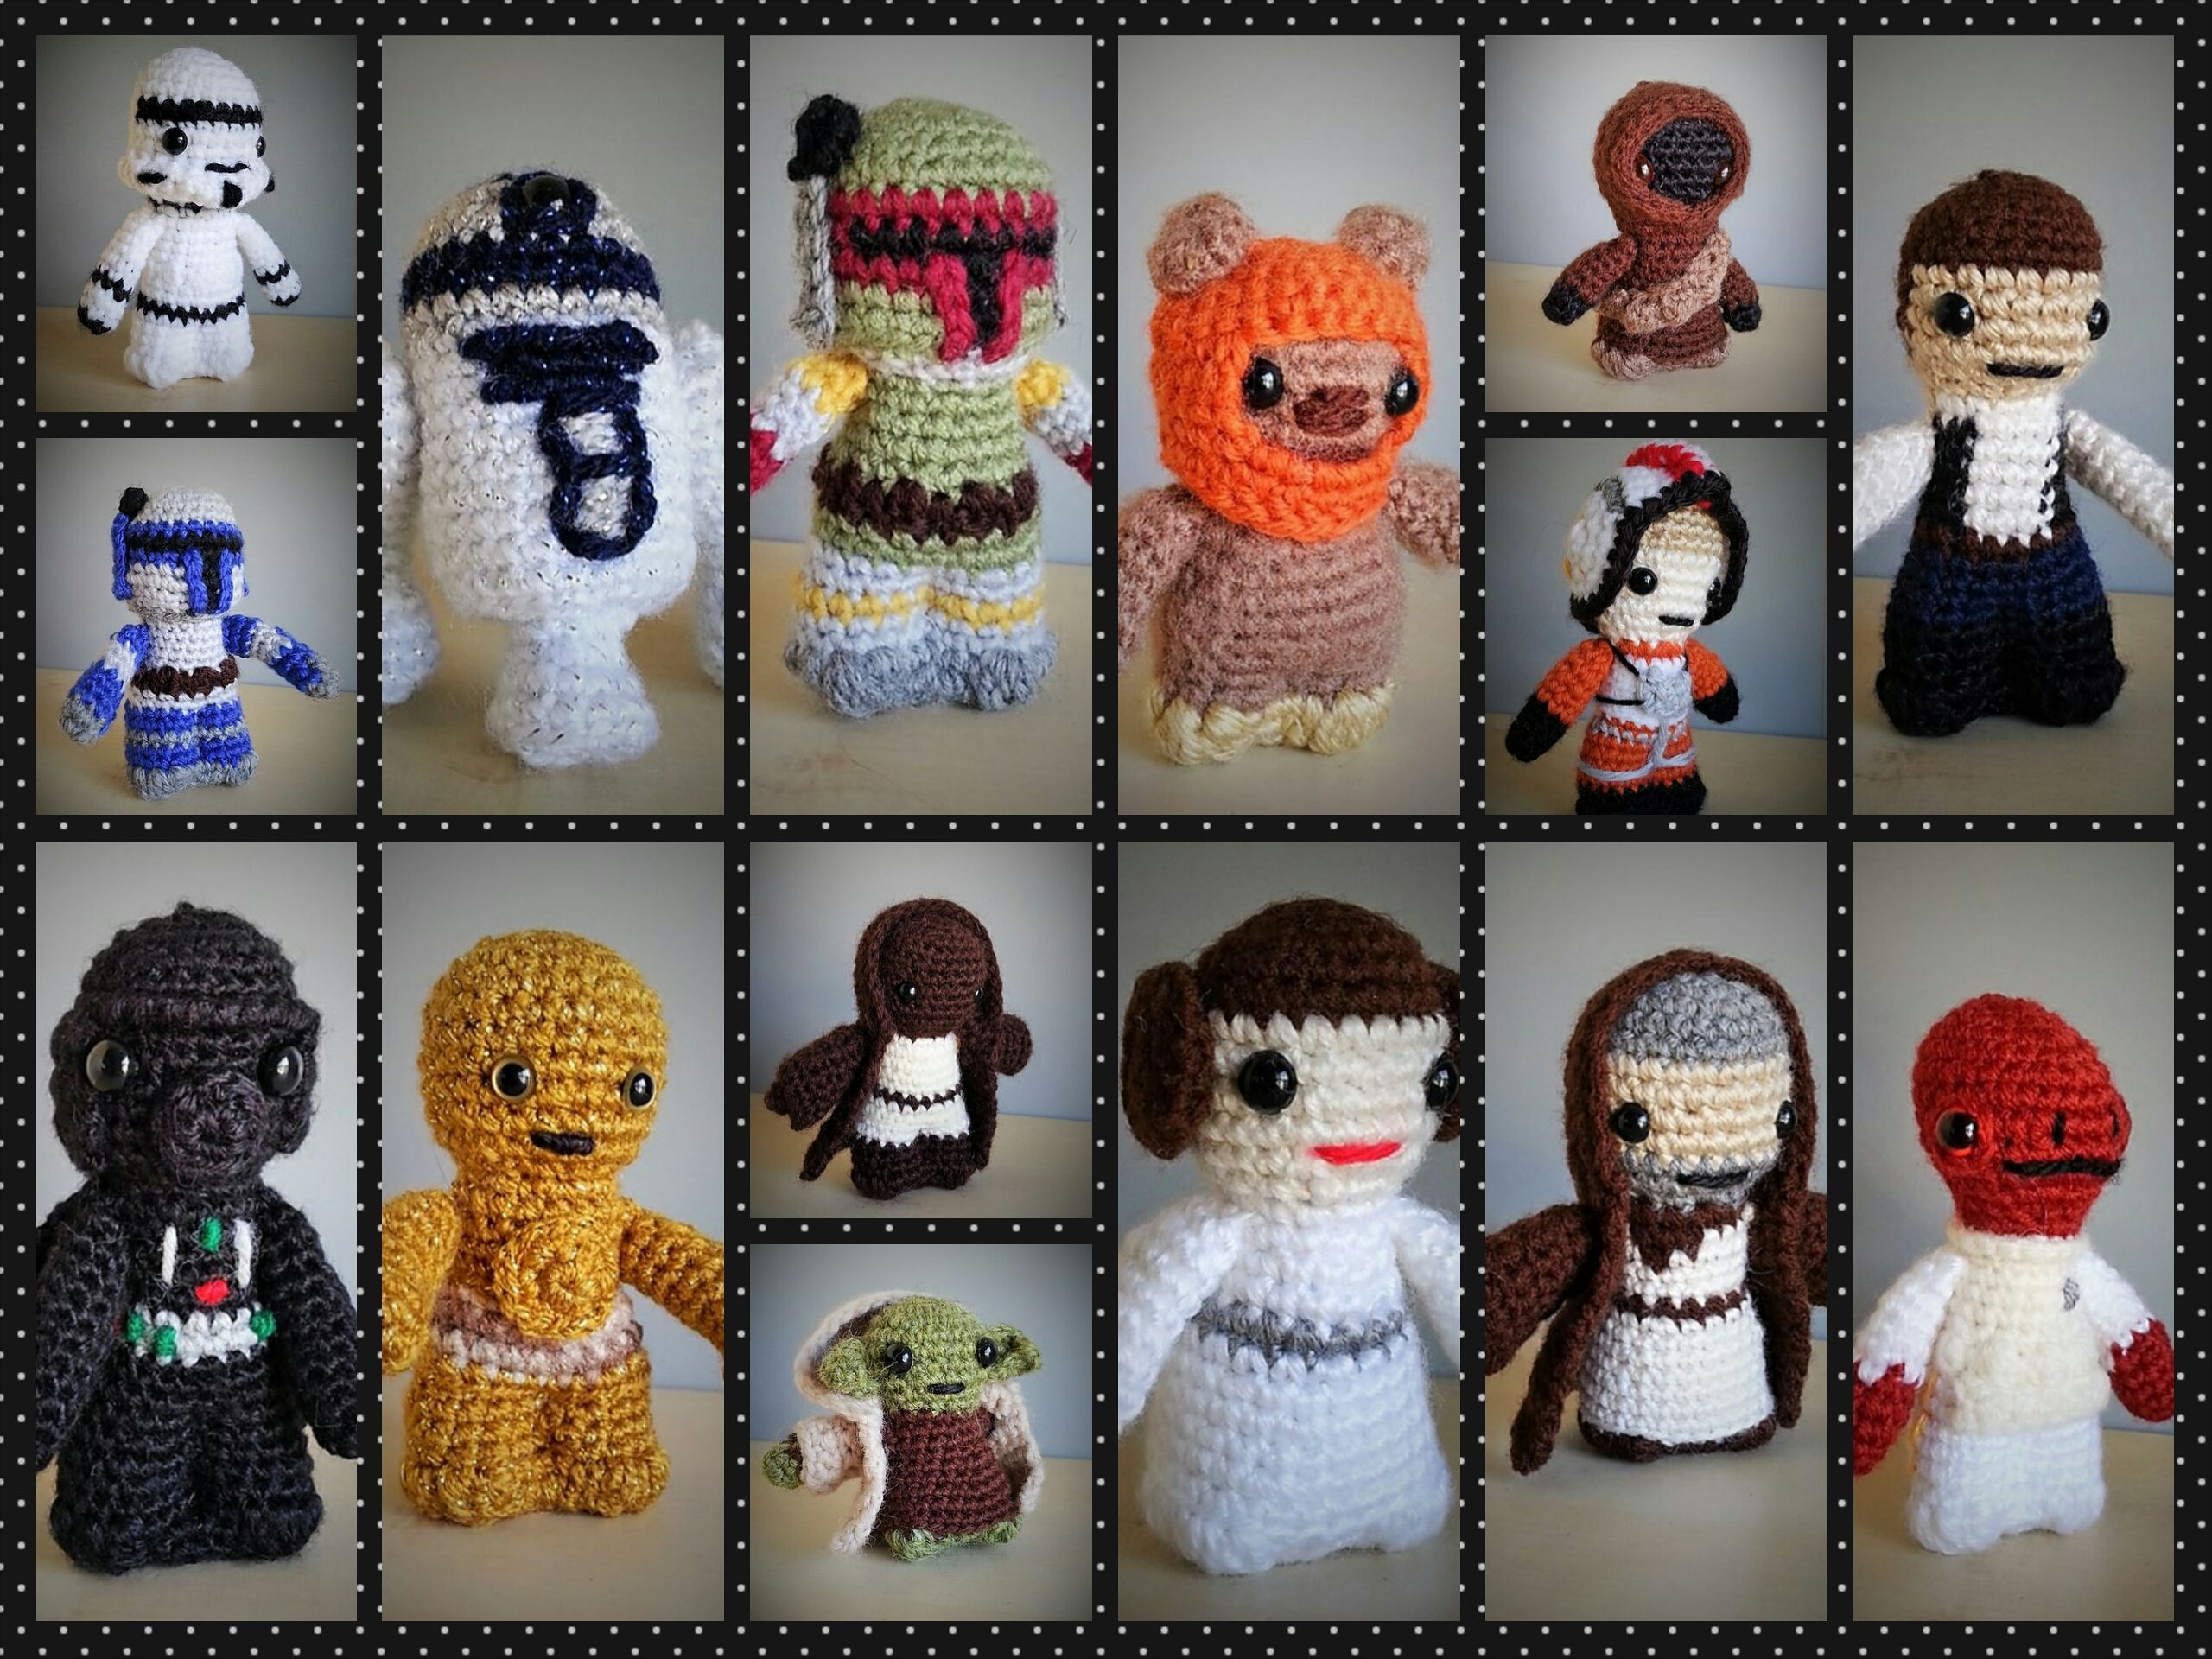 The Crew Knitted hats, Crochet hats, Crochet